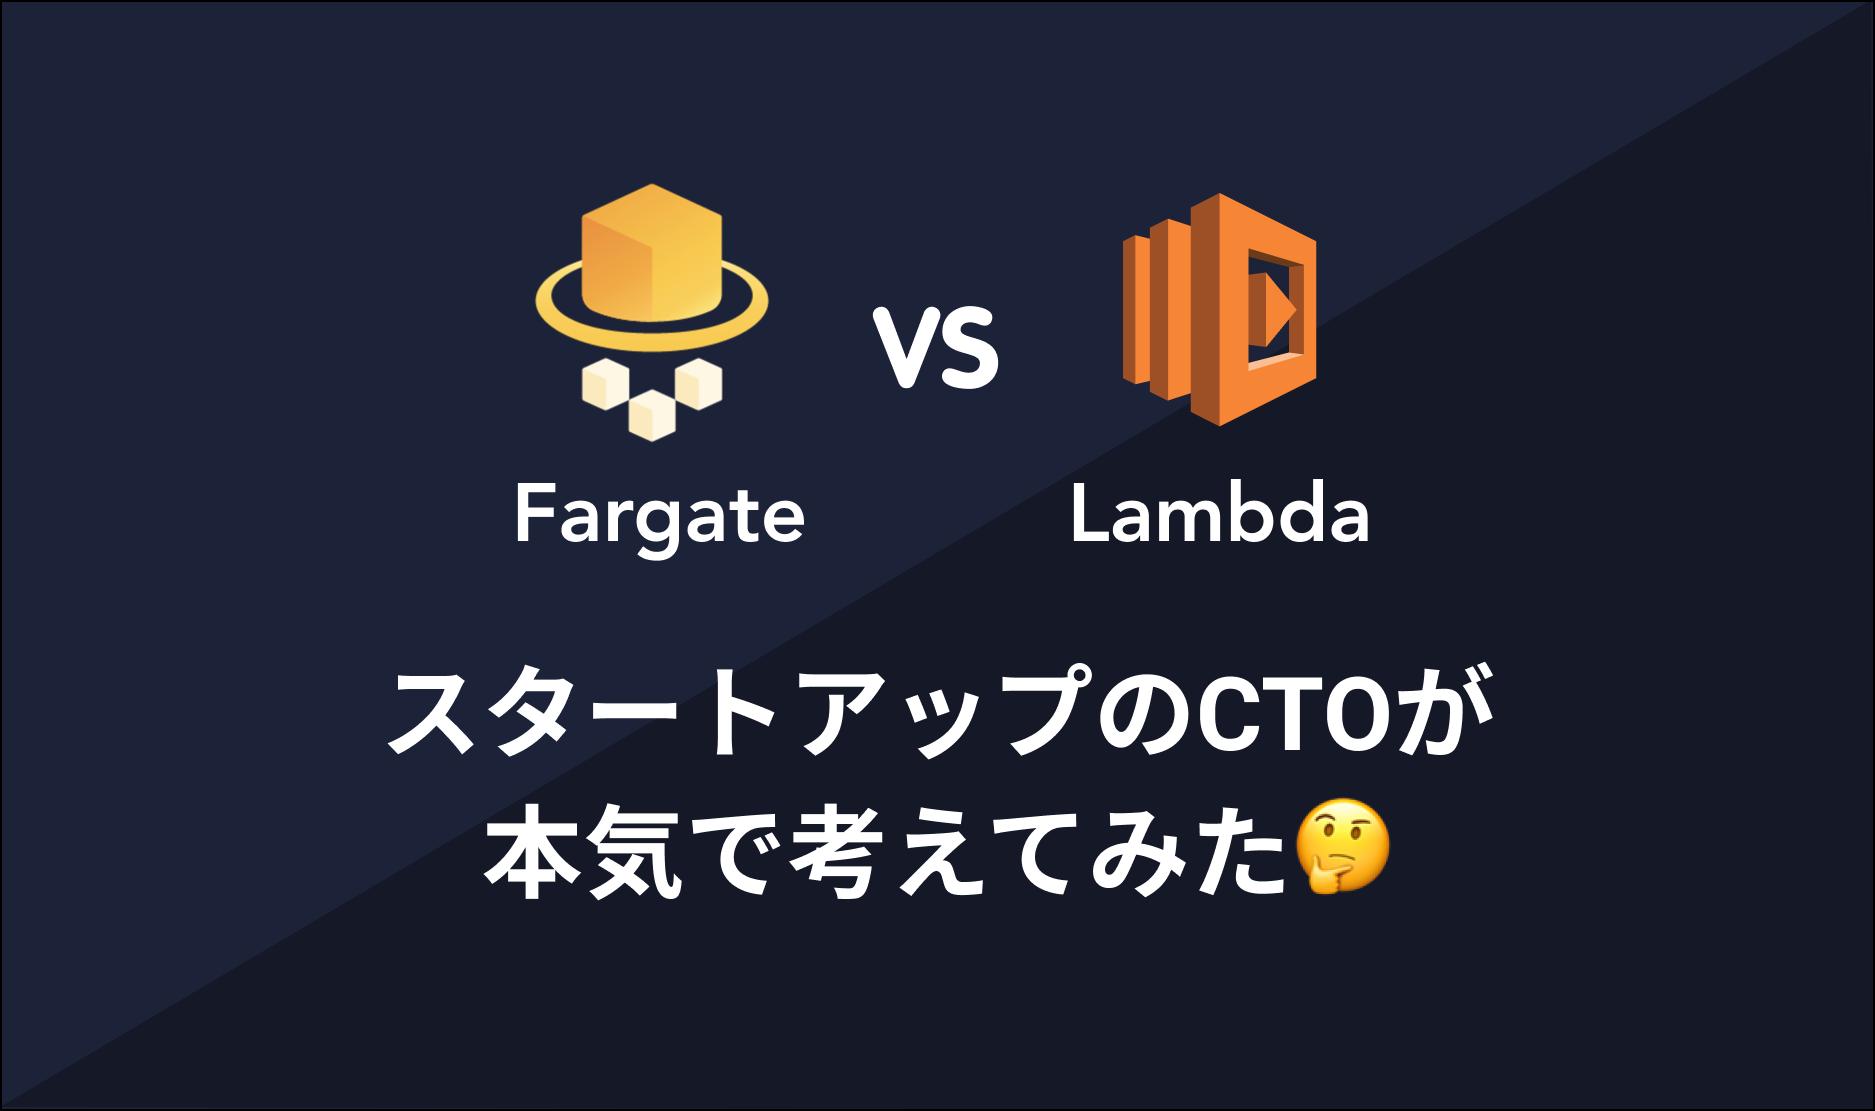 Fargate VS Lambda 両者の違いをスタートアップCTOが本気で考えてみた!